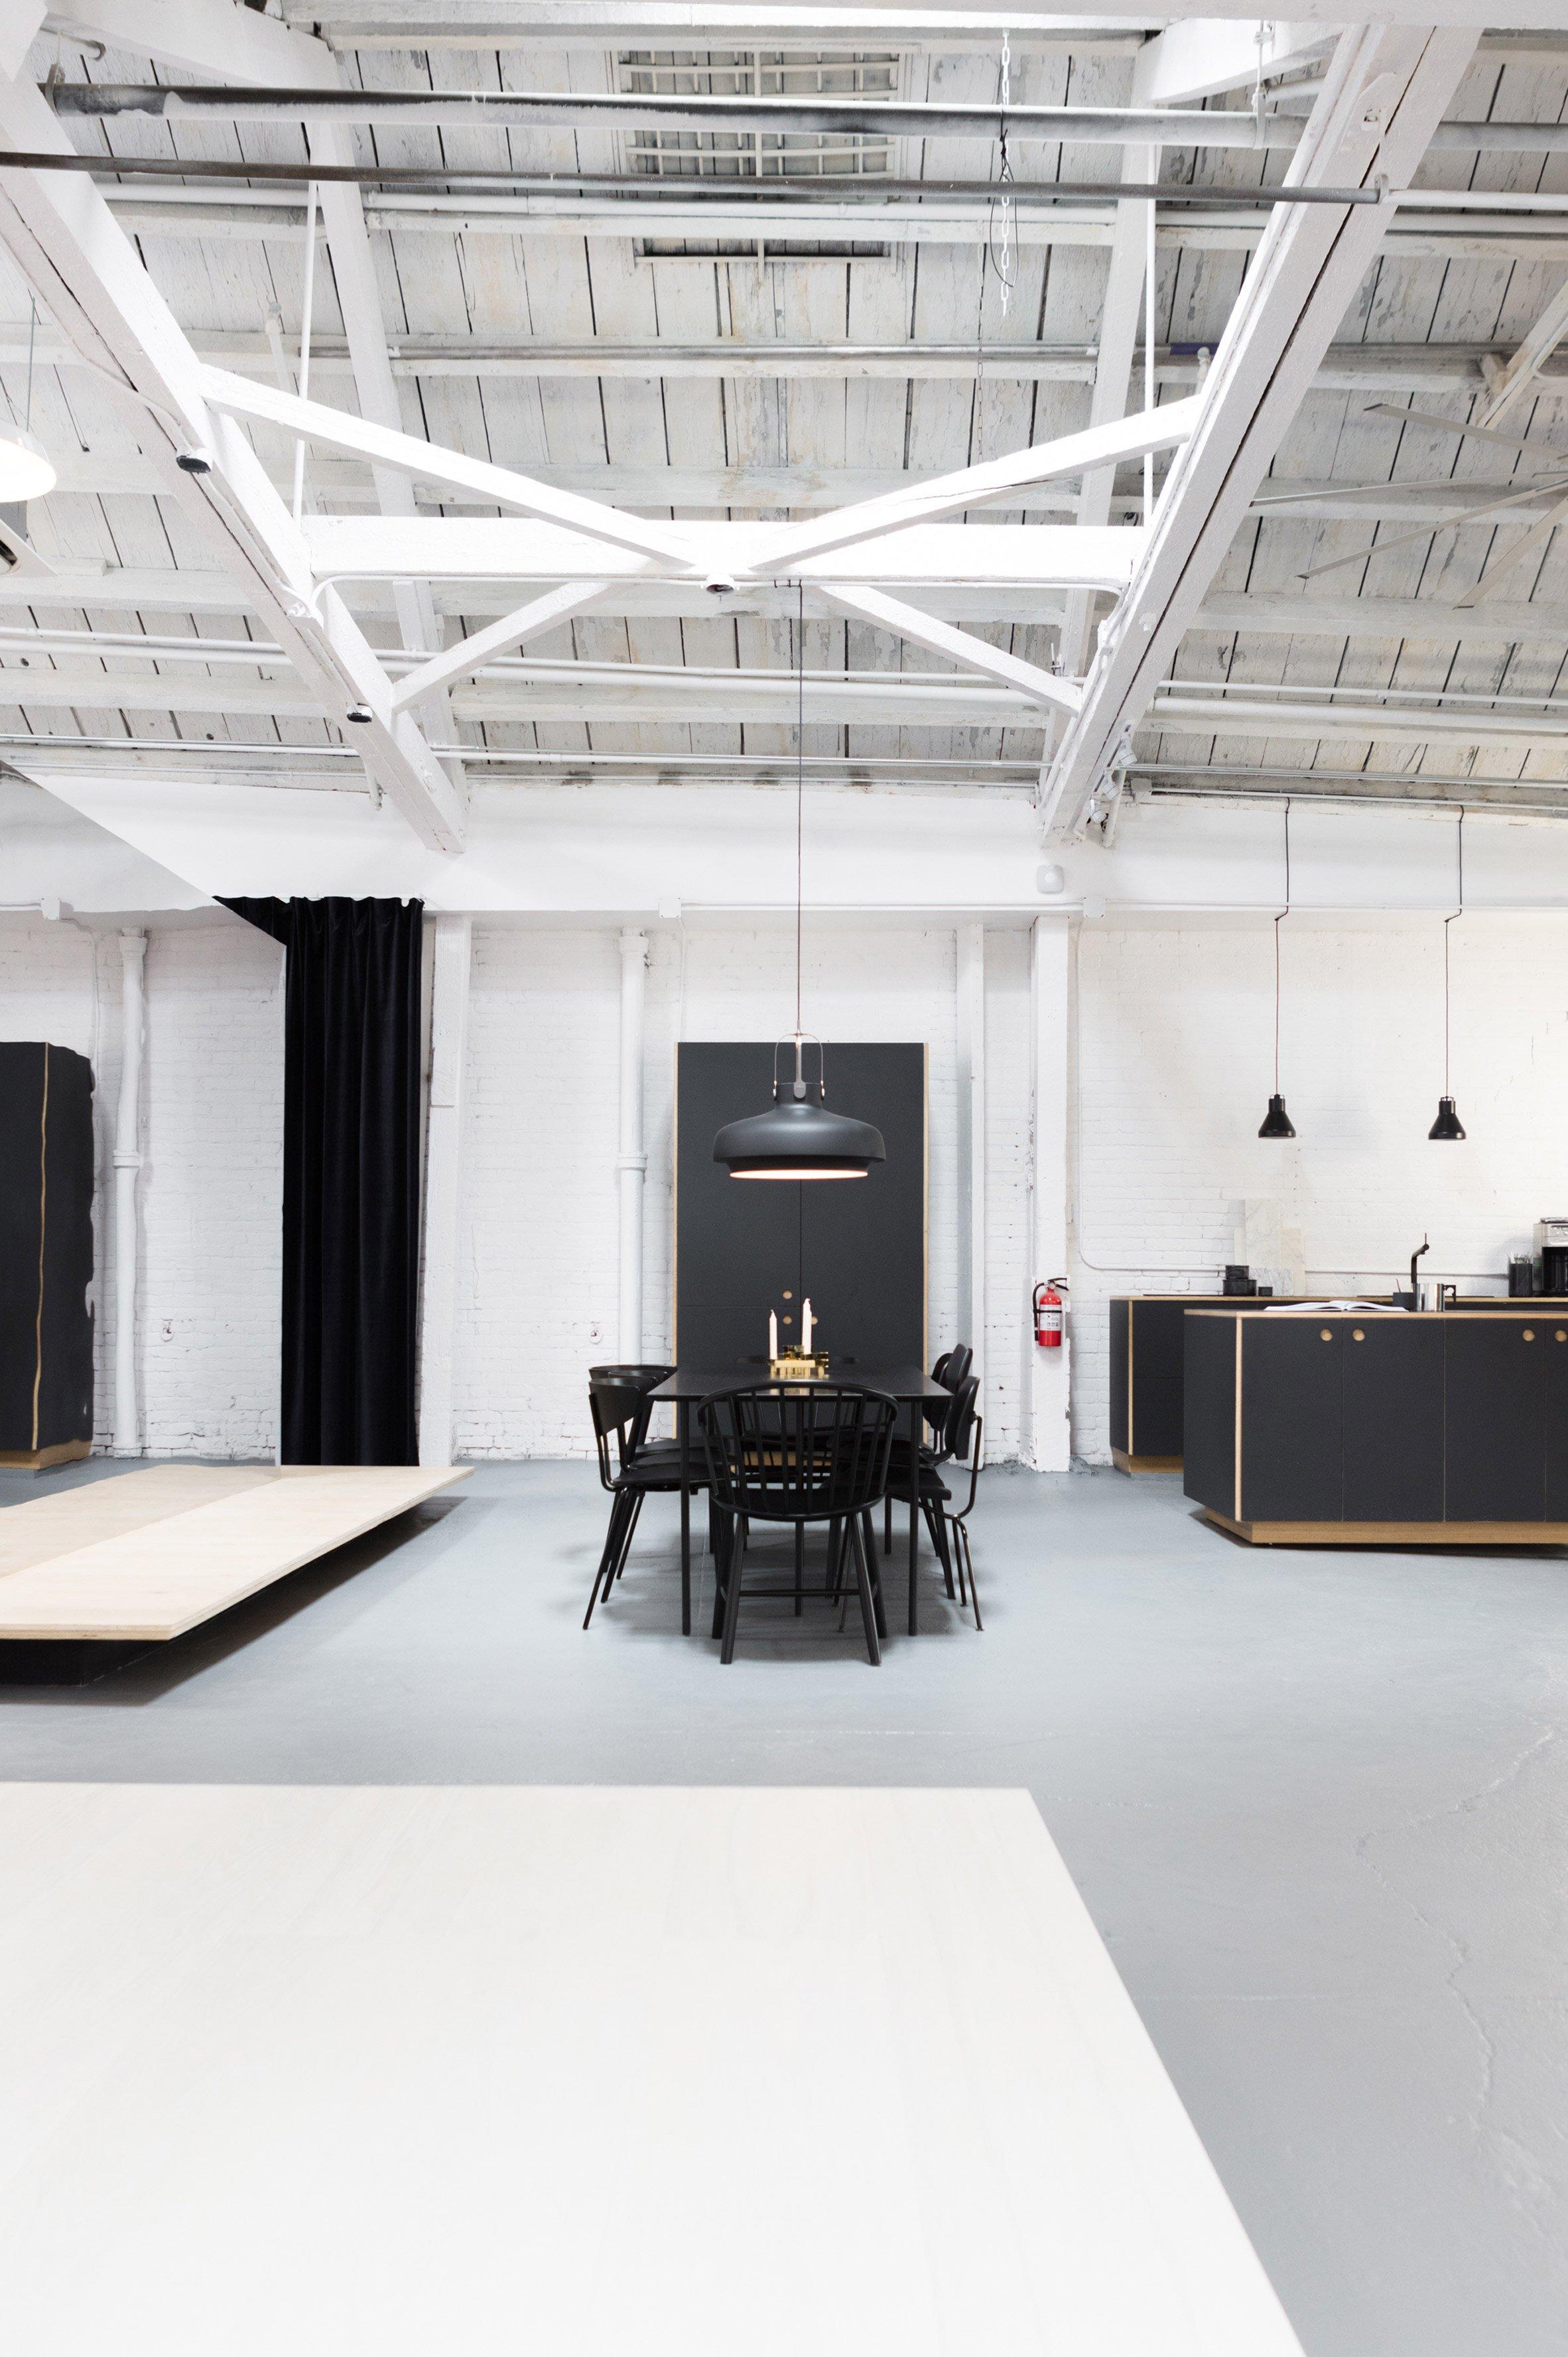 Kitchen Showrooms Ikea ikea kitchen hacks are stars of new brooklyn design showroom - curbed